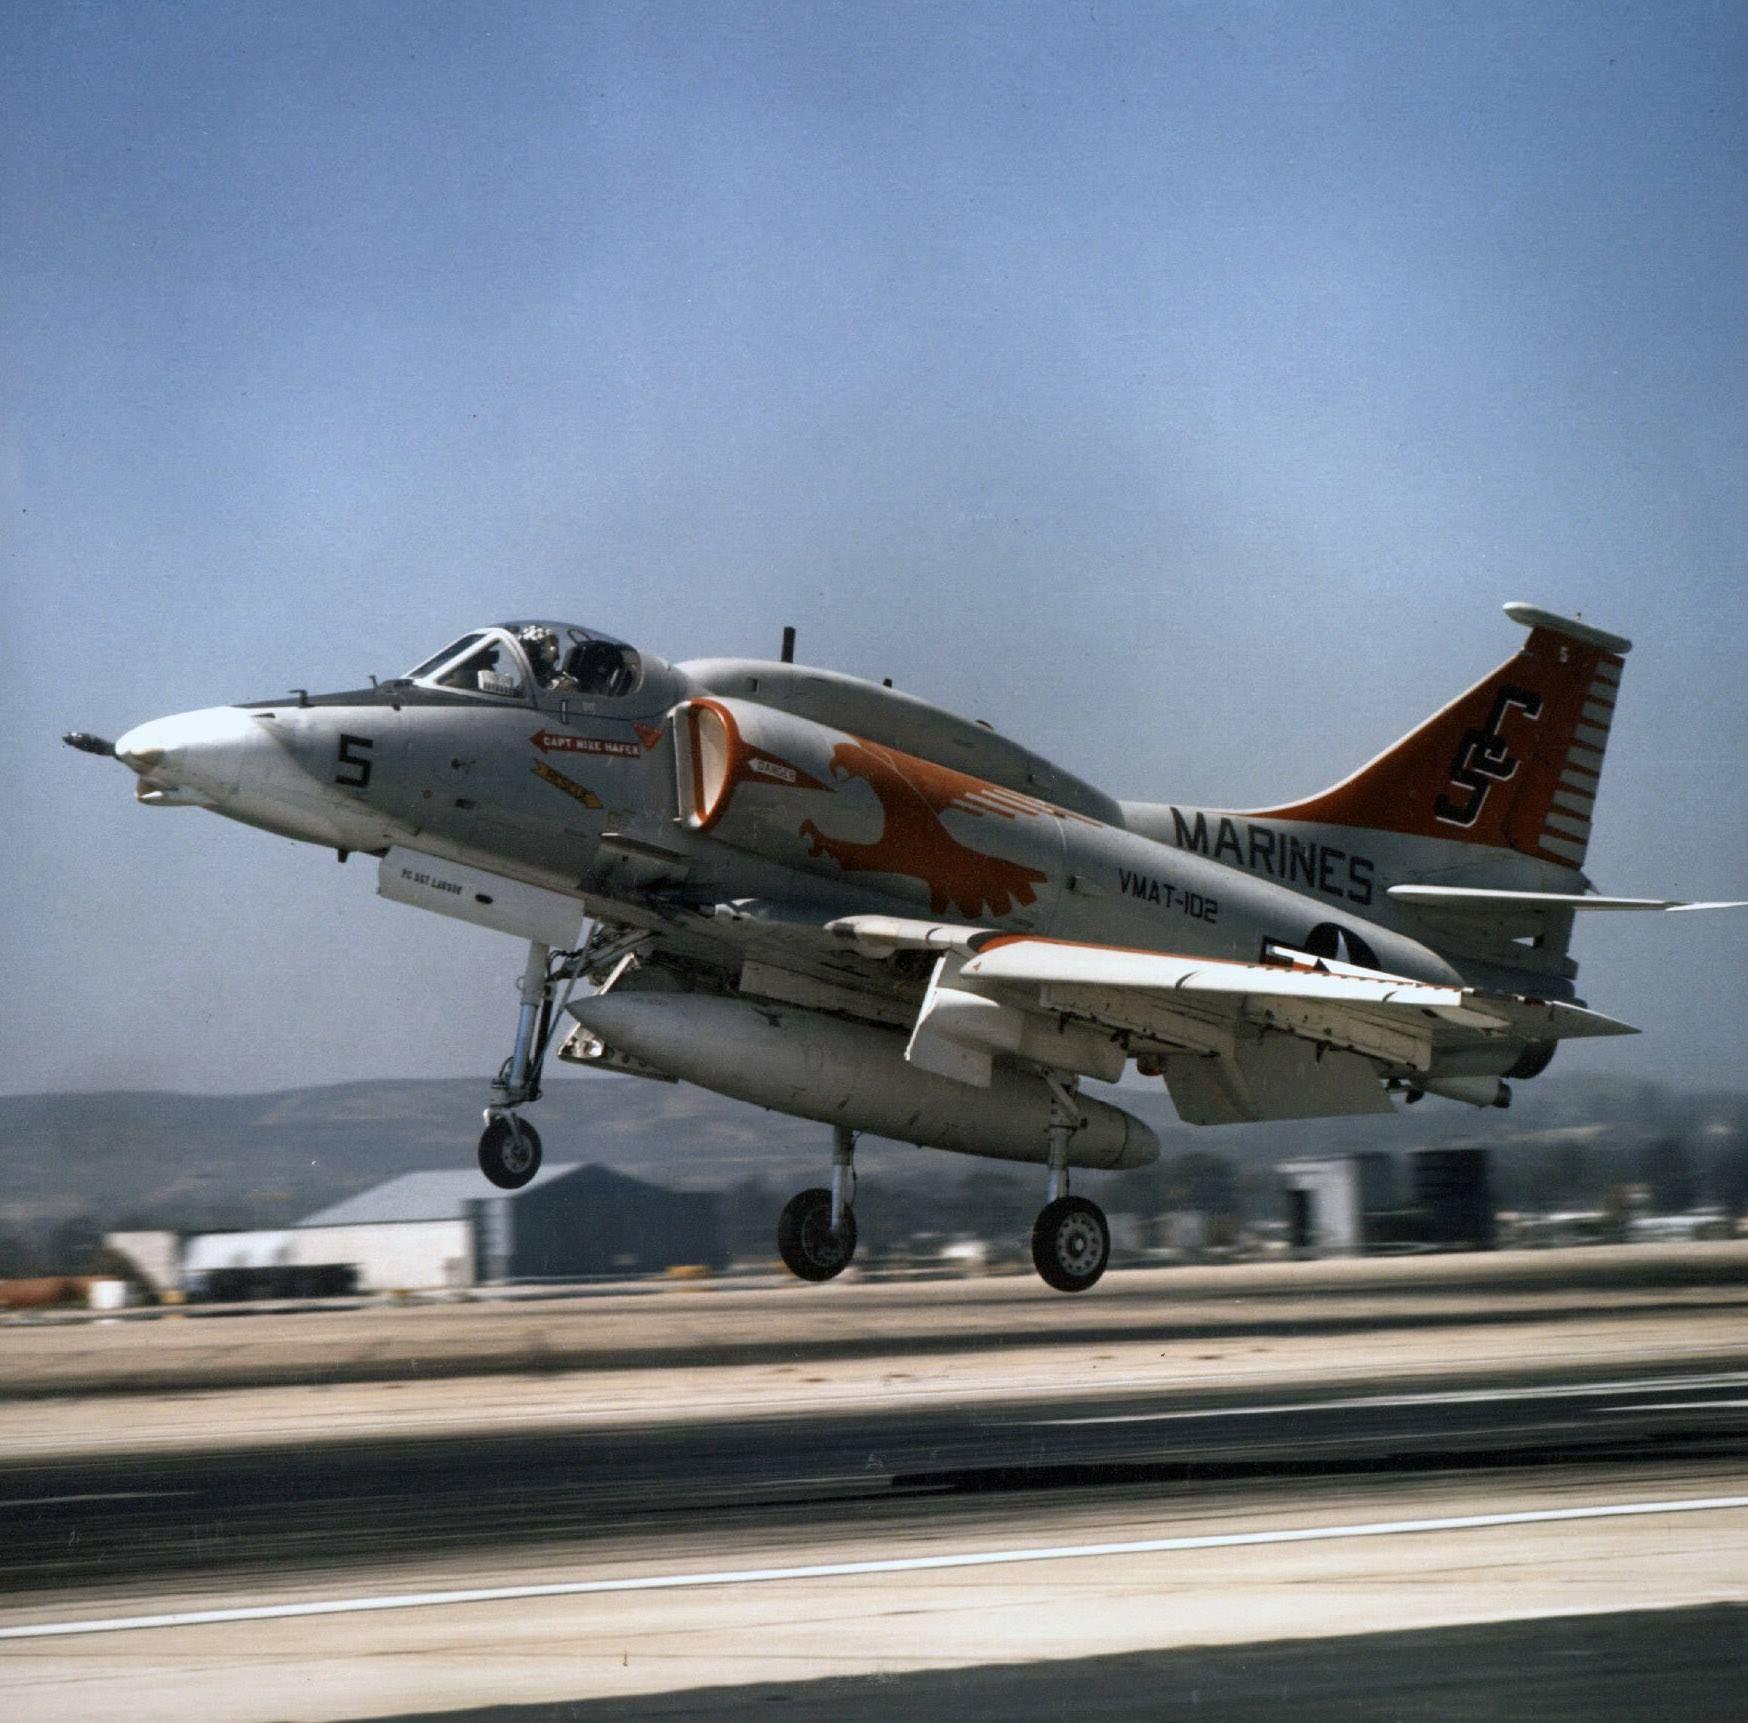 An a4m skyhawk of marine attack training squadron vmat